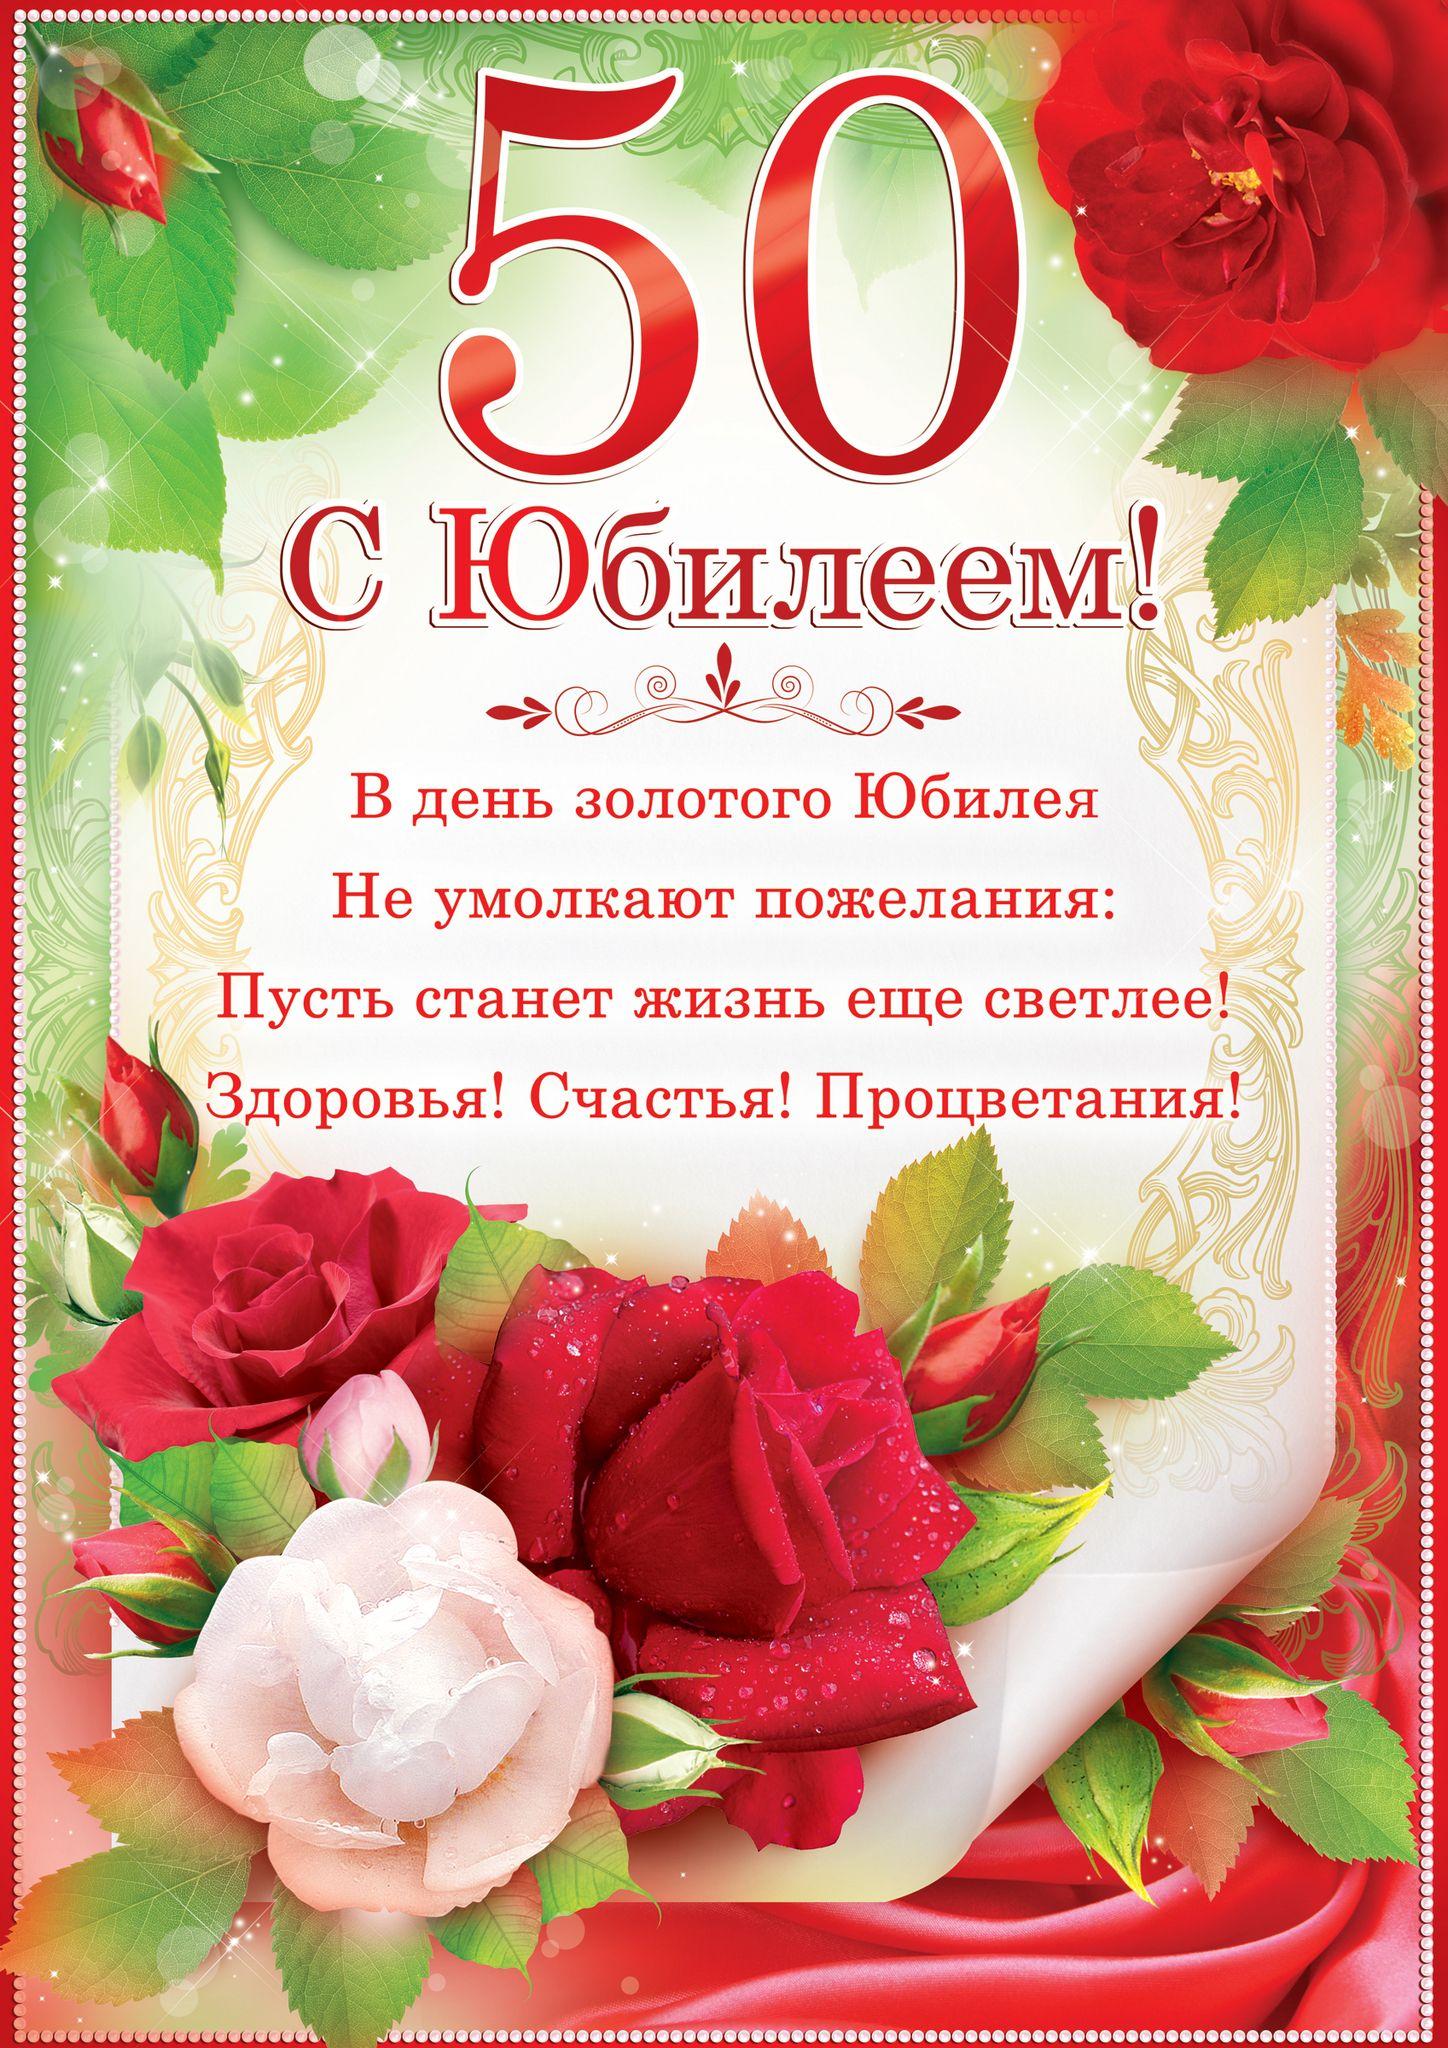 Поздравление с юбилеи открытка